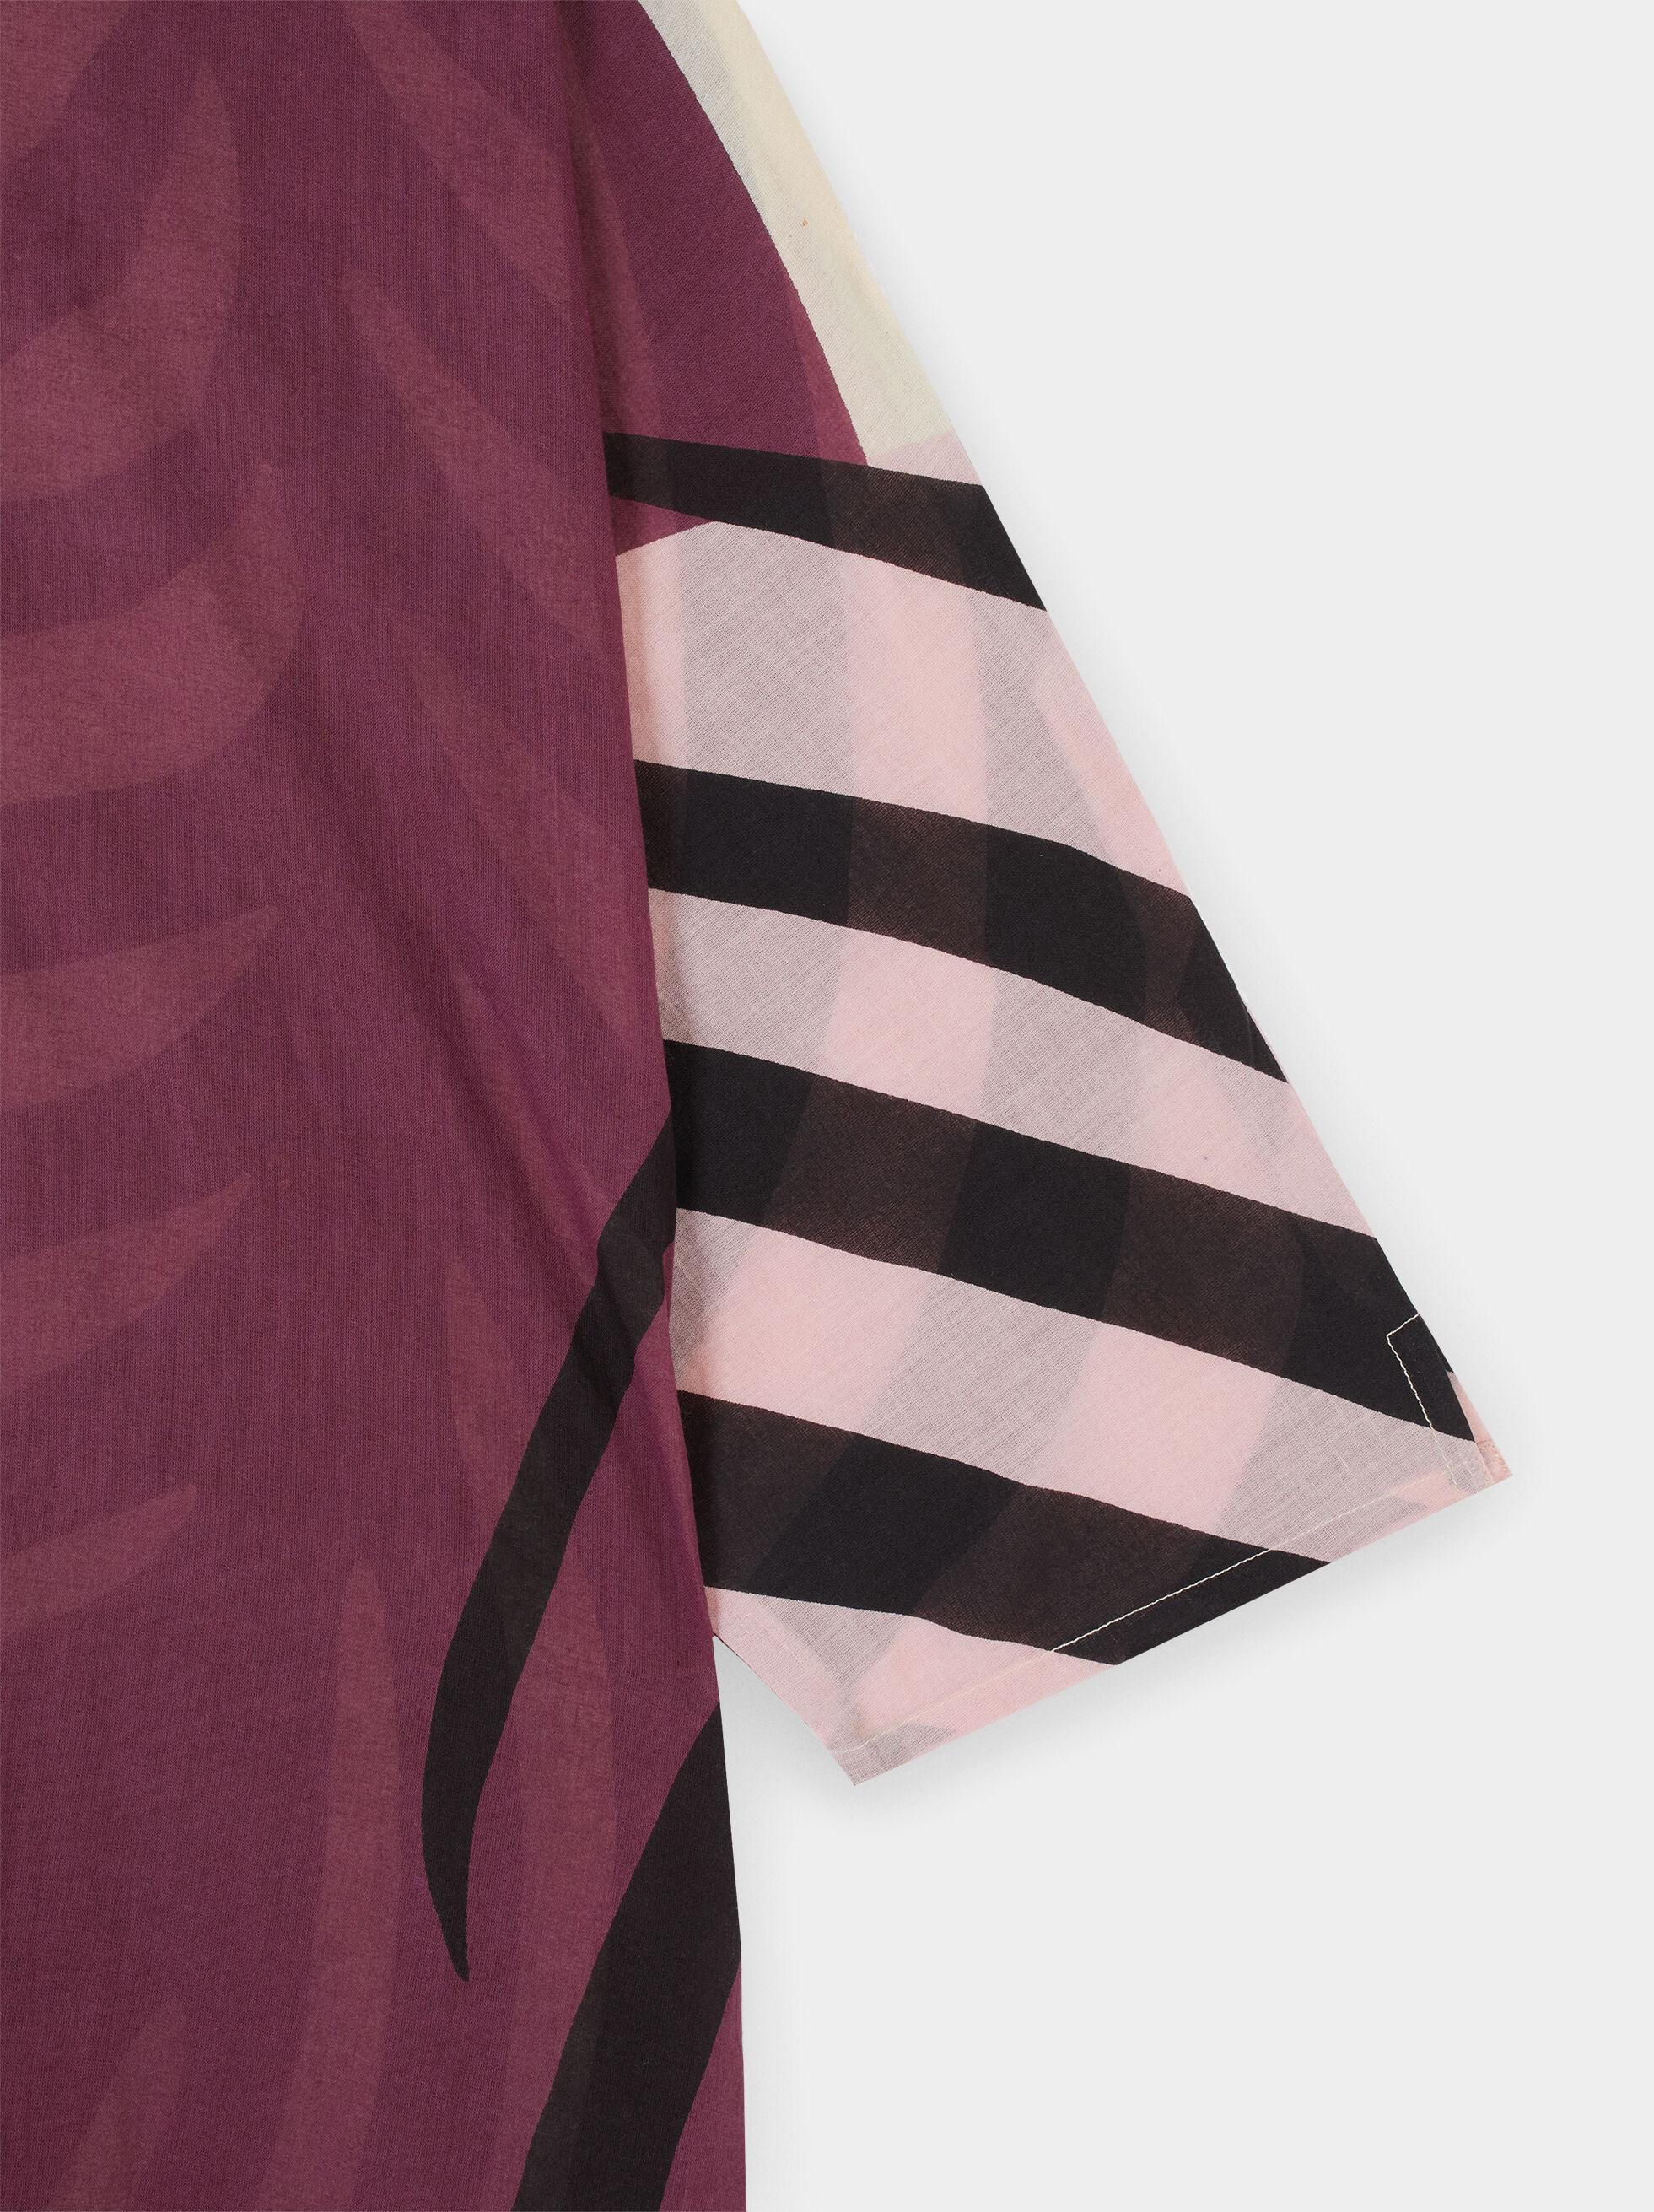 Flowing Leaf Print Dress, Pink, hi-res